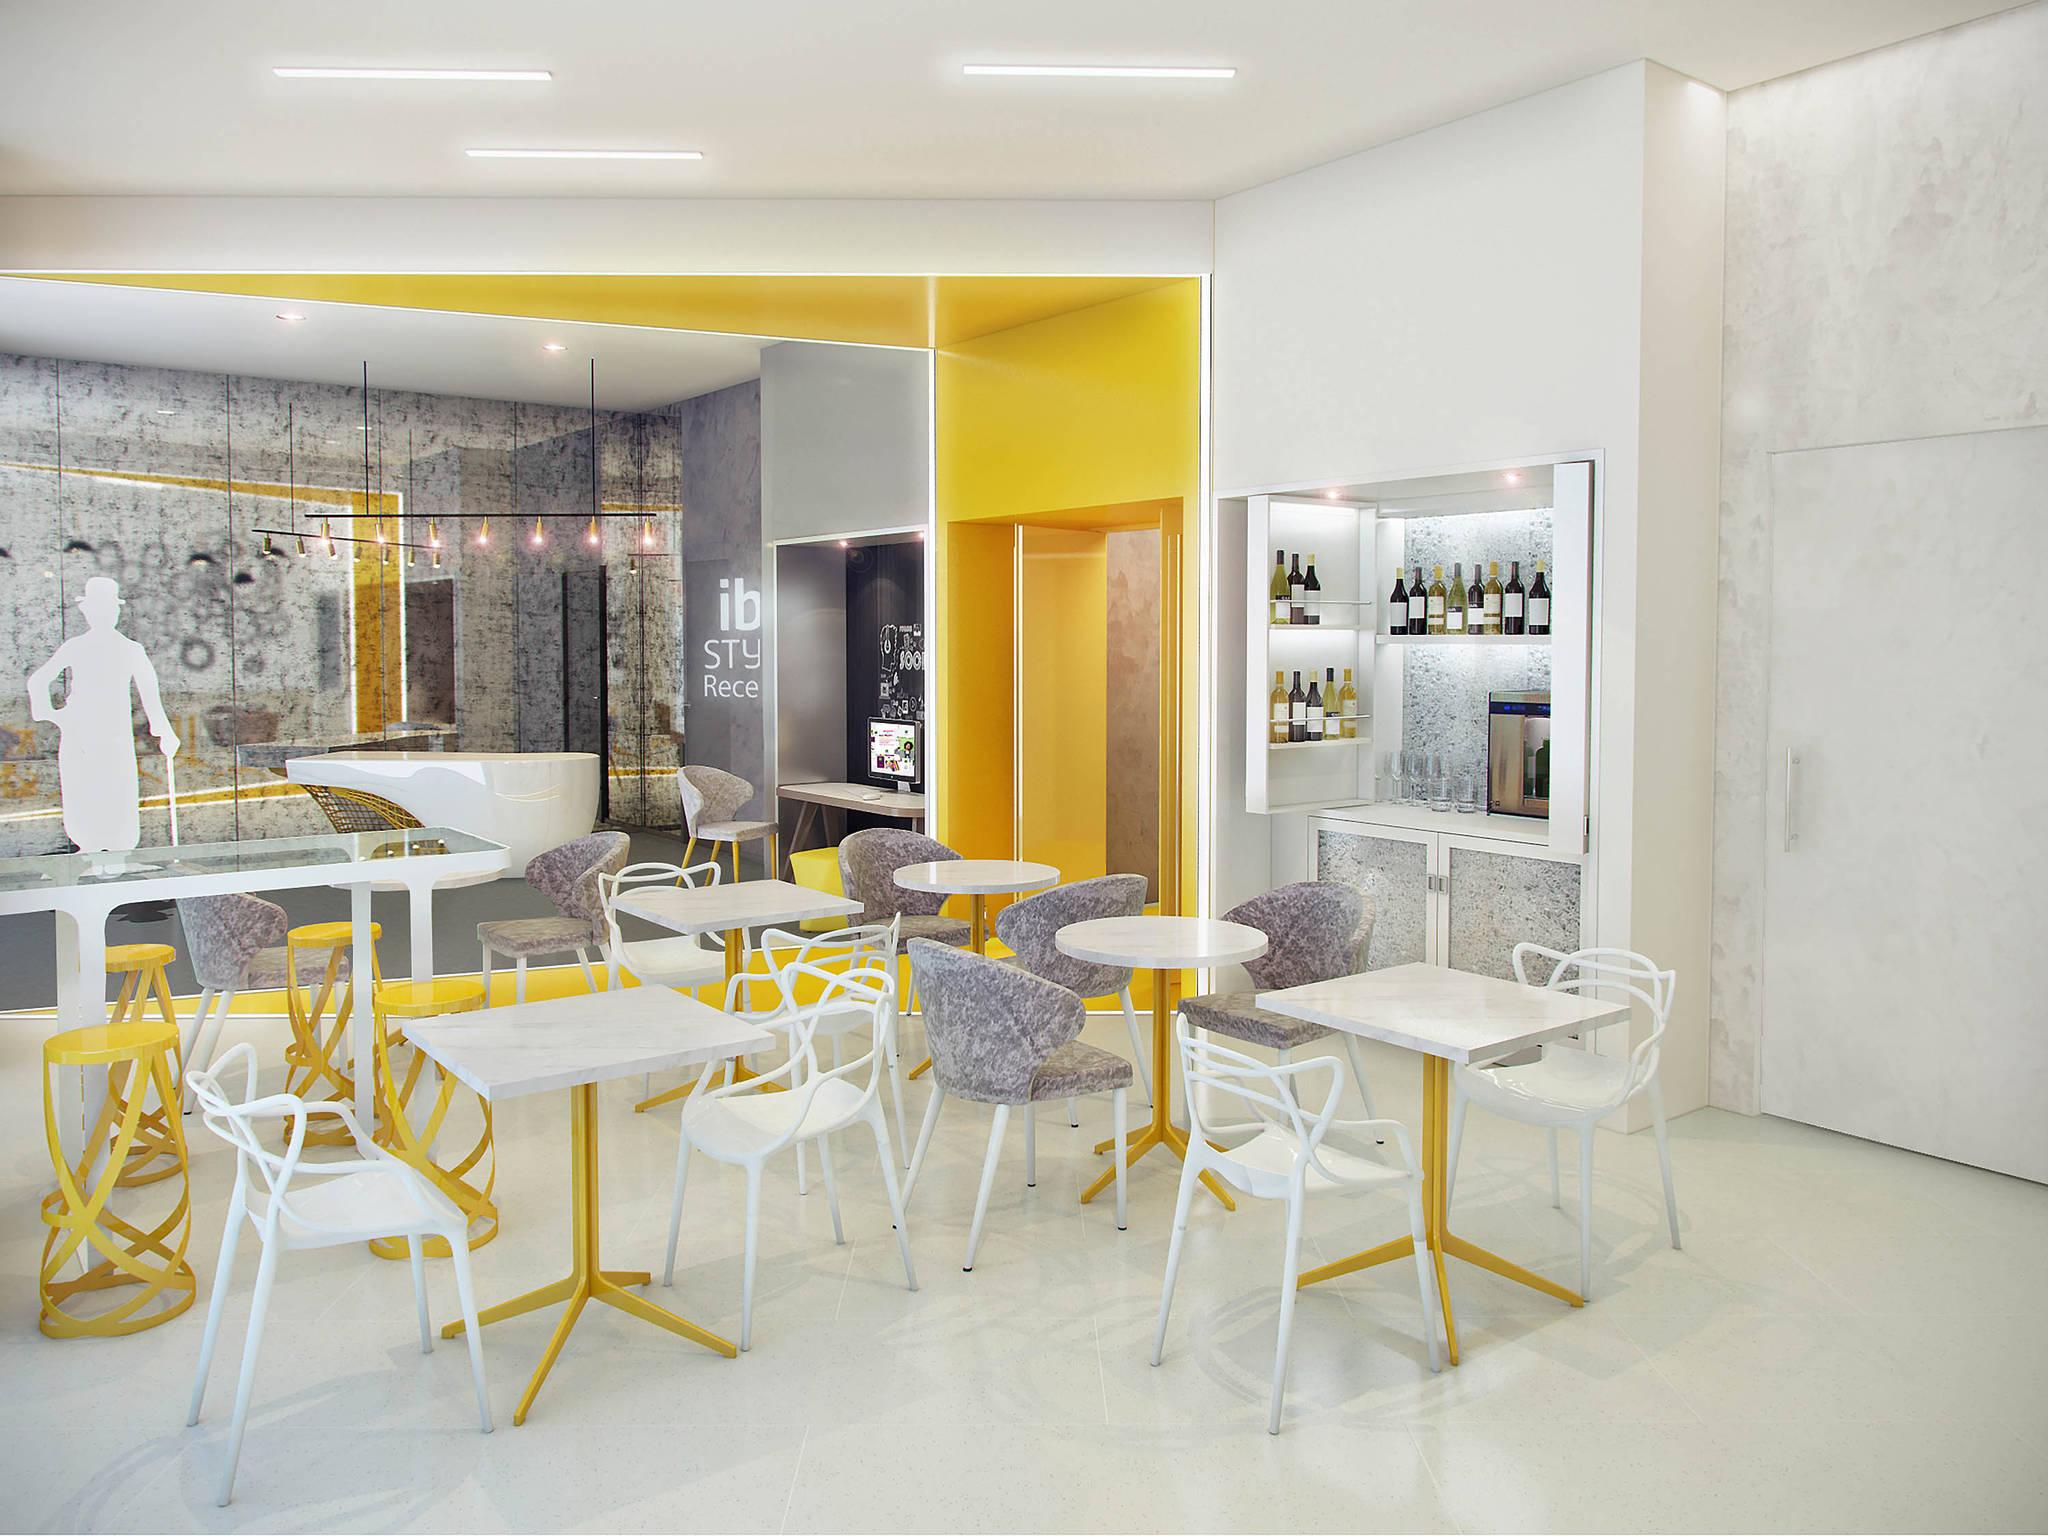 فندق - IBIS STYLES جنيف مون بلان